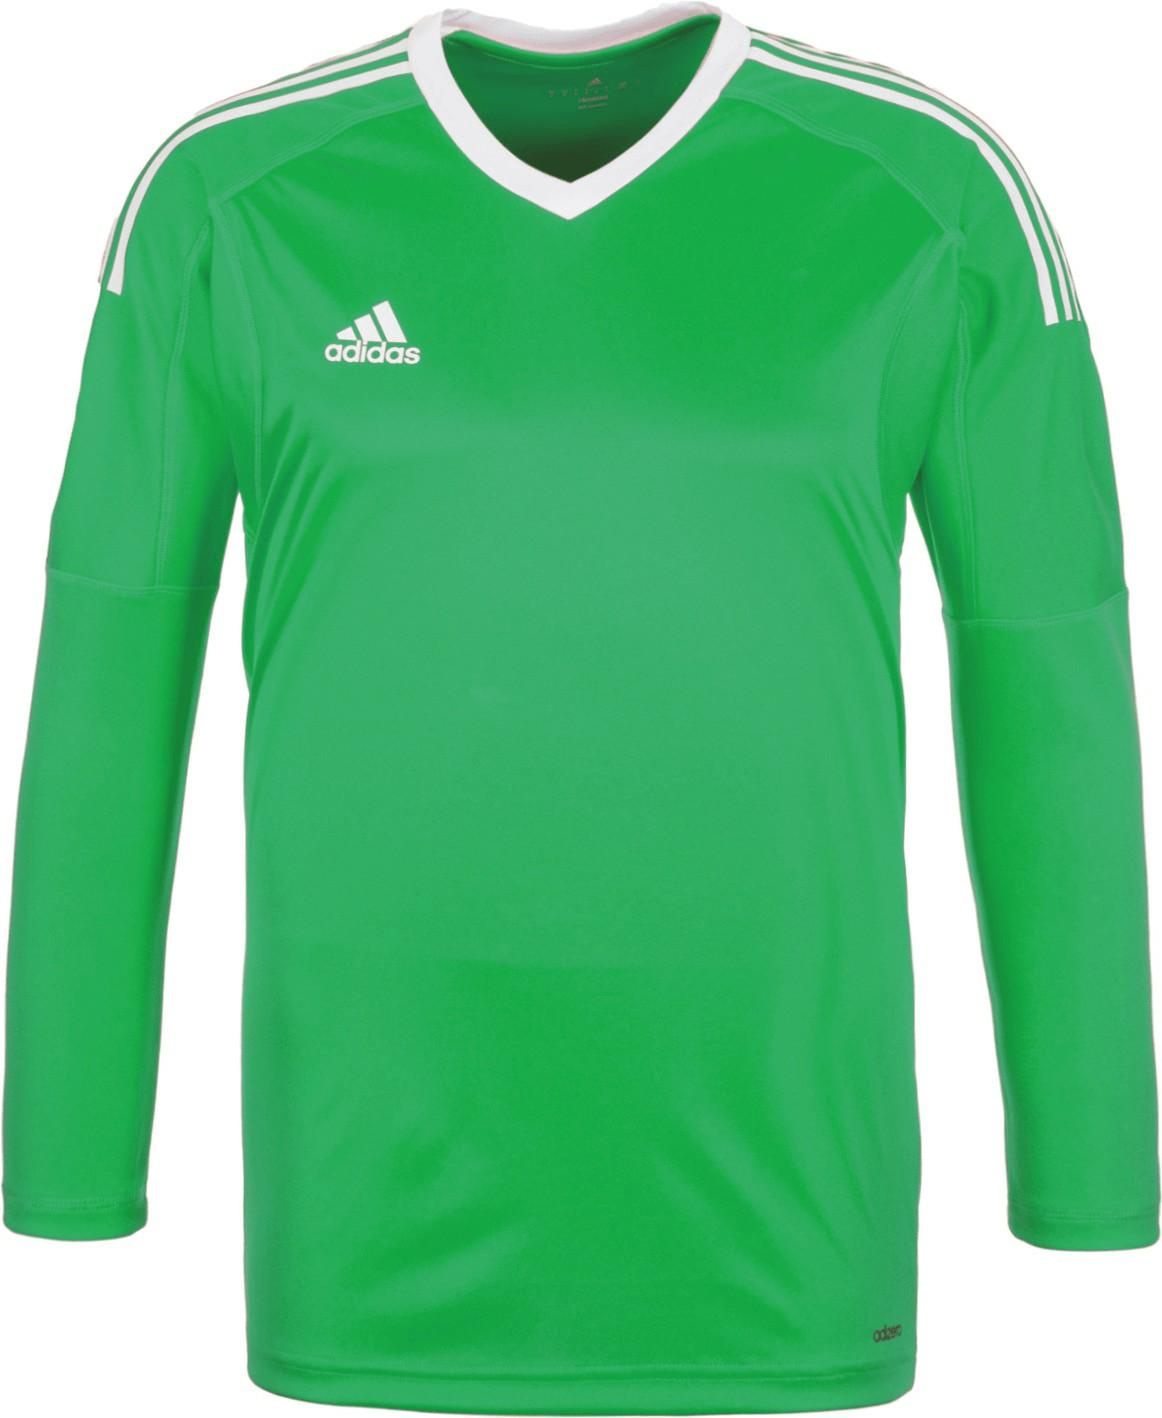 Adidas Revigo 17 Goalkeeper Jersey Youth green